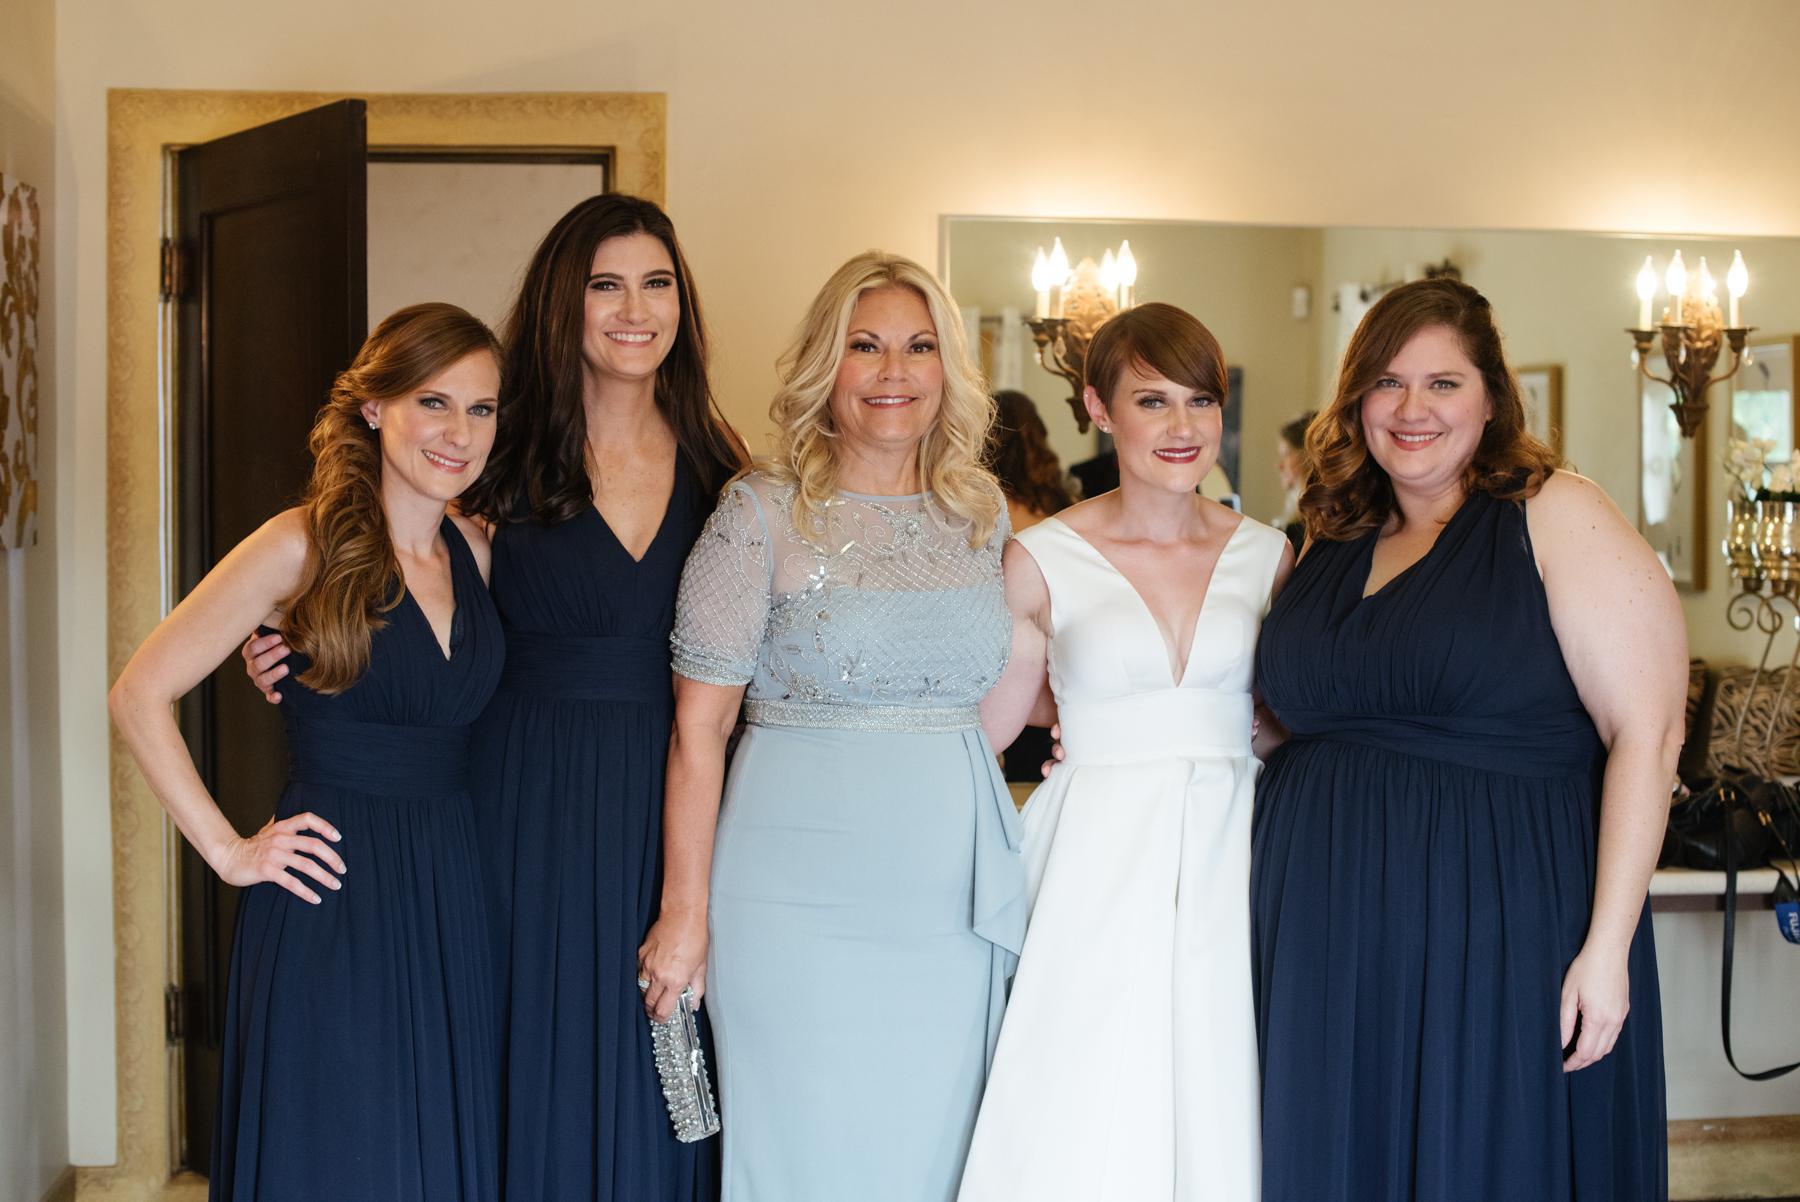 Secret Garden Event Center Wedding - Meredith Amadee Photography-77.jpg